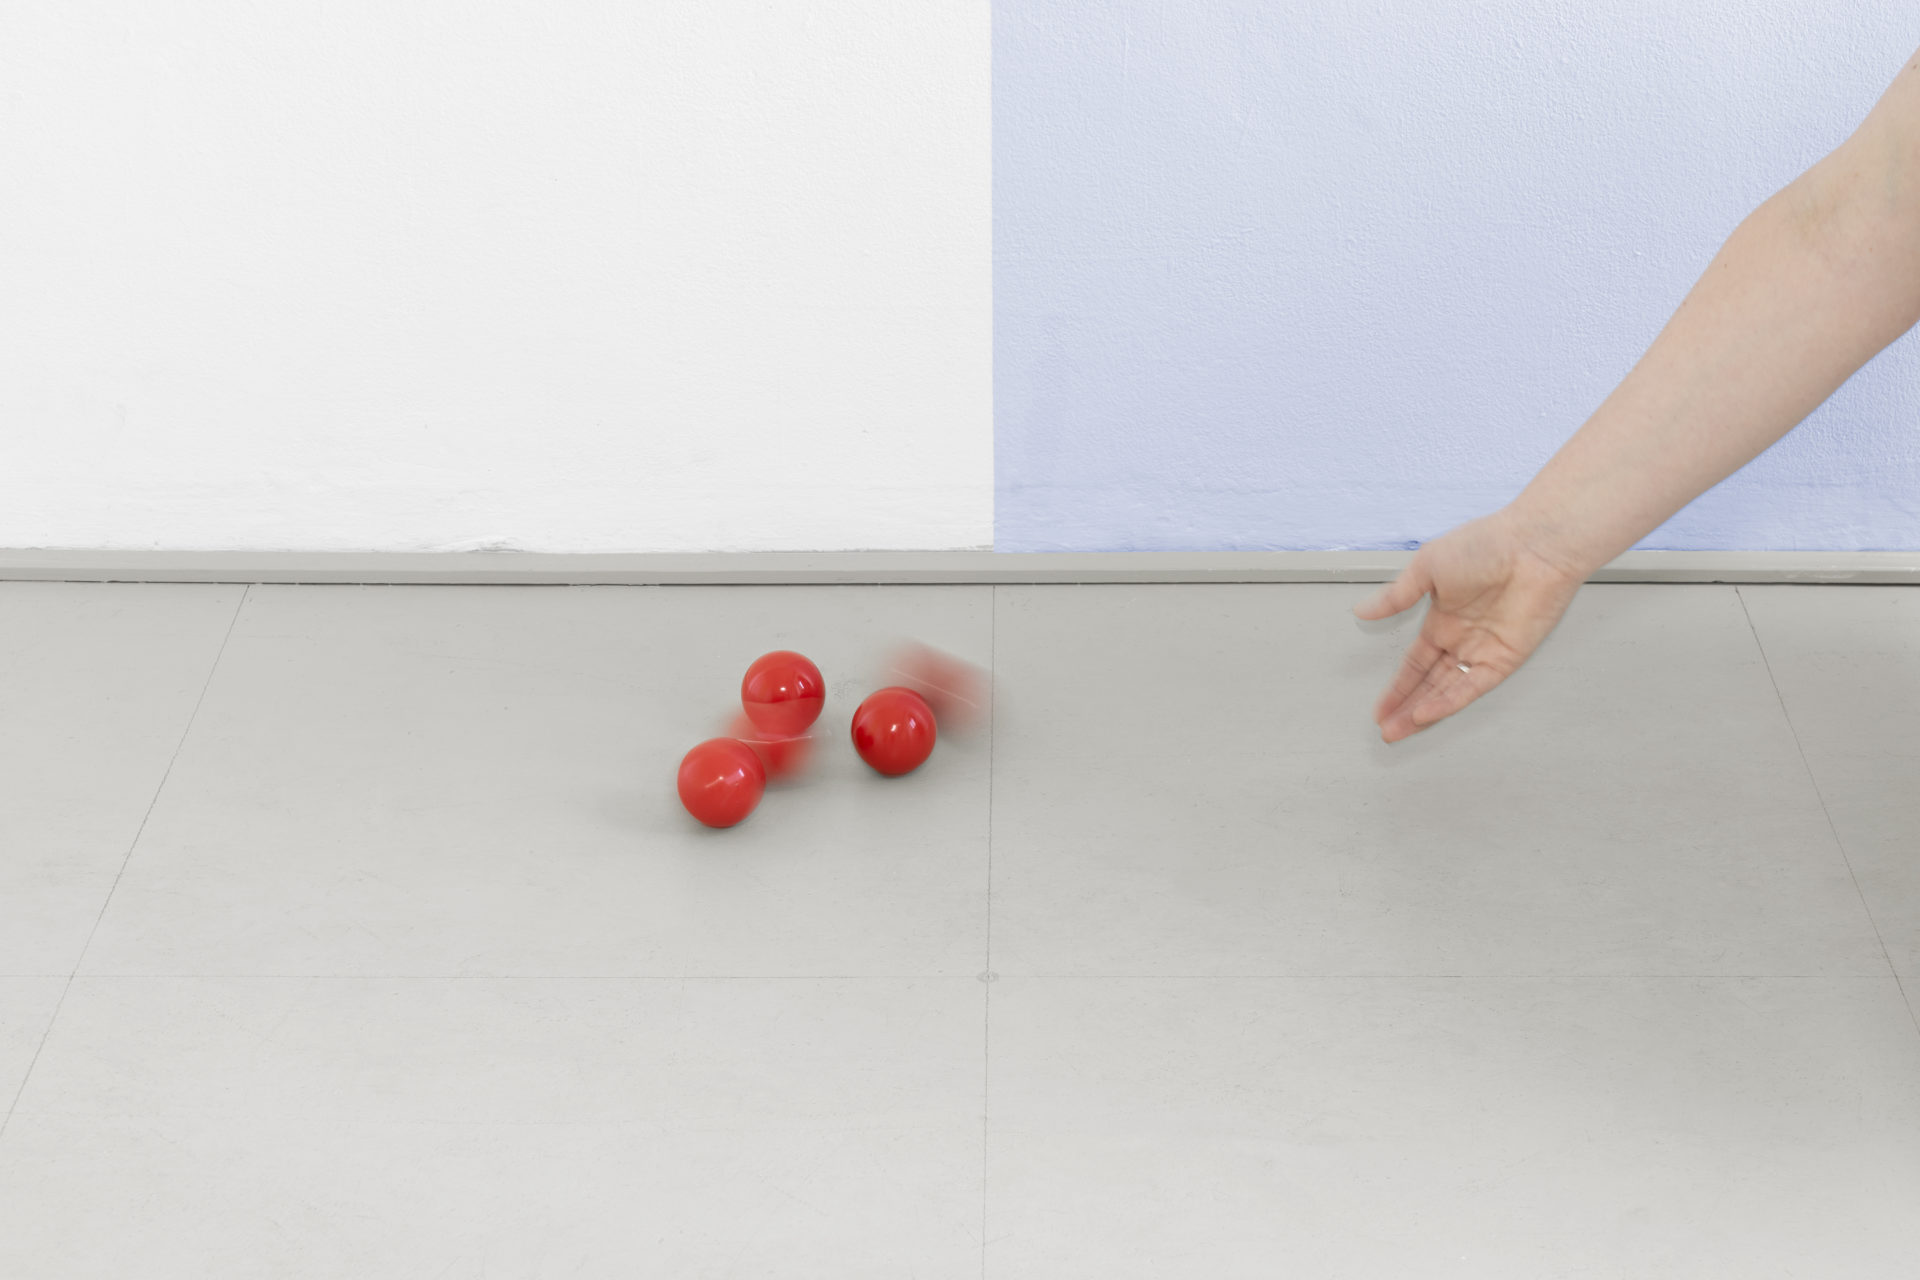 """You are the Input"" by Ingunn Fjóla Ingthorsdóttir at Gallerie Herold, Bremen"